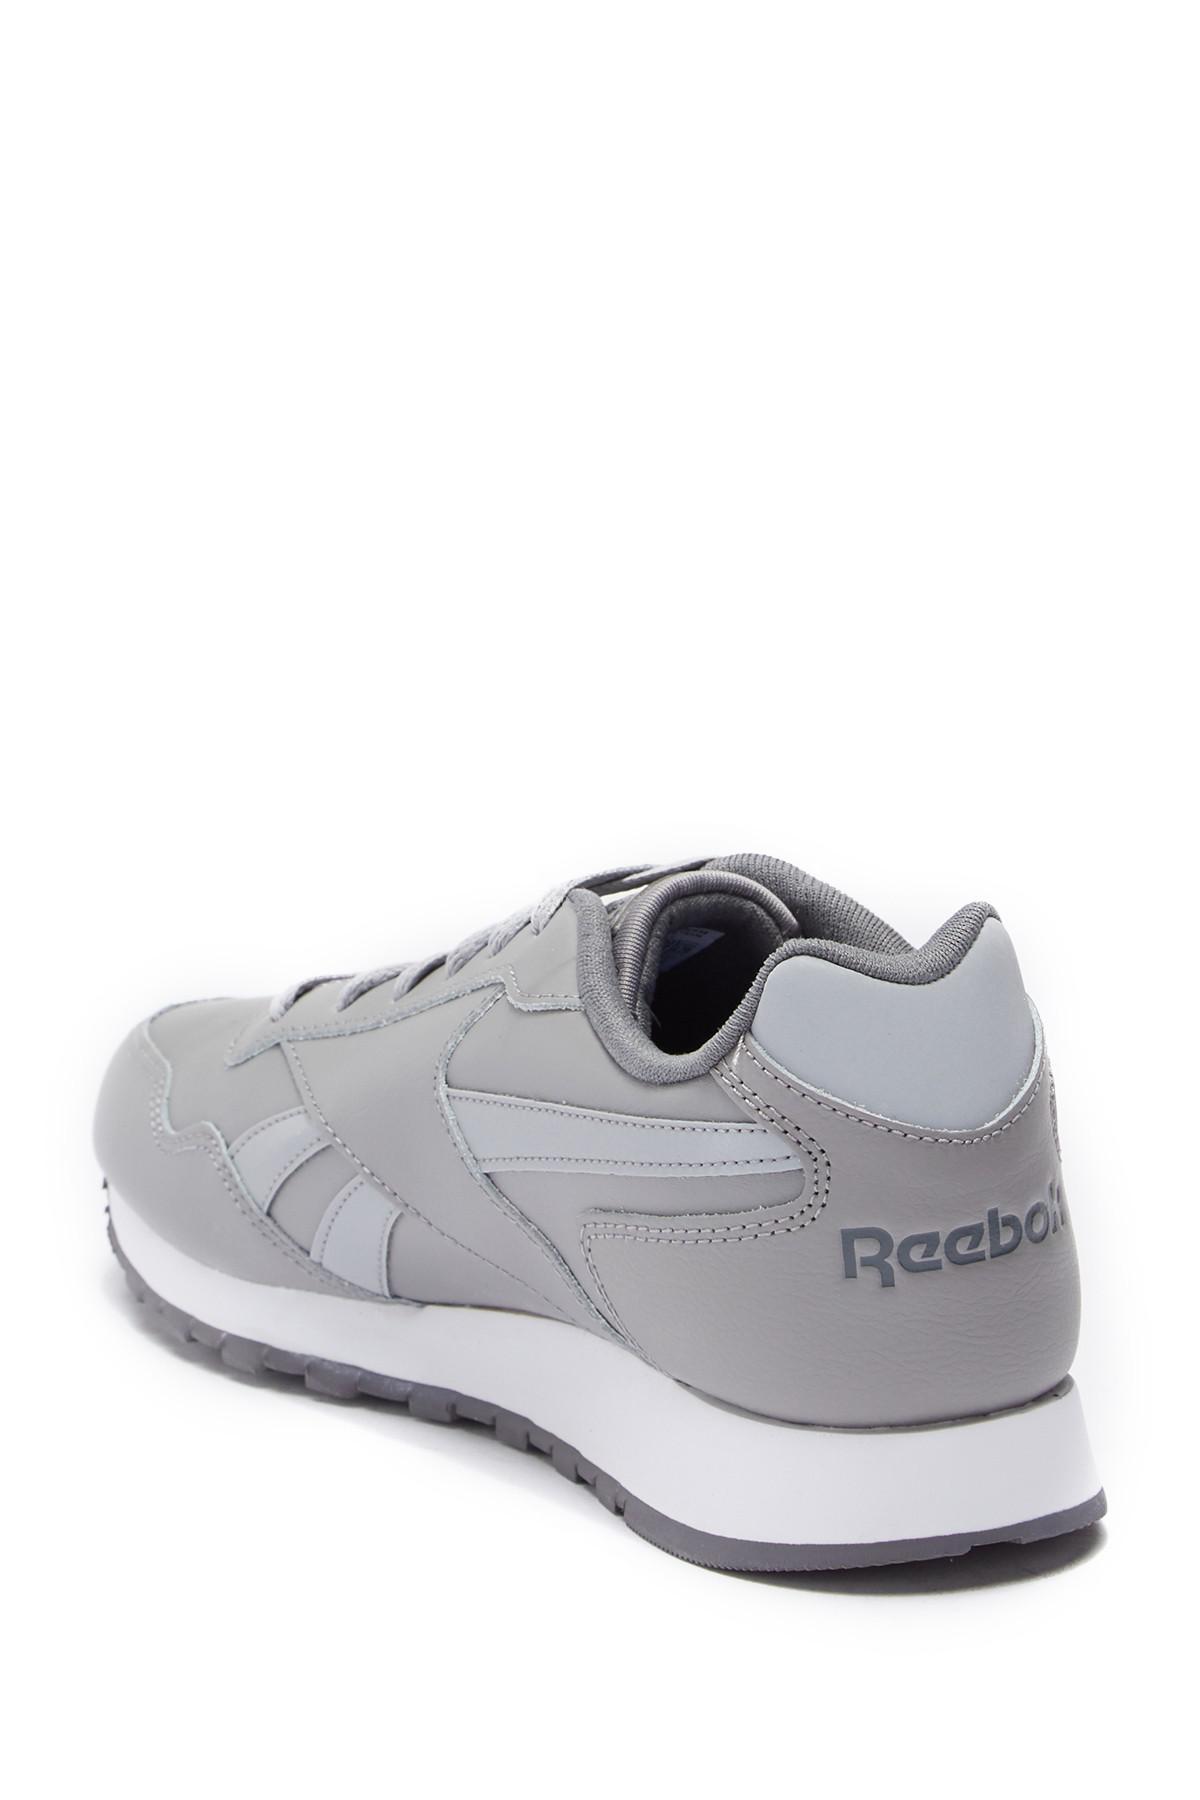 a454648137b26 Lyst - Reebok Classic Harman Leather Running Sneaker in Gray for Men